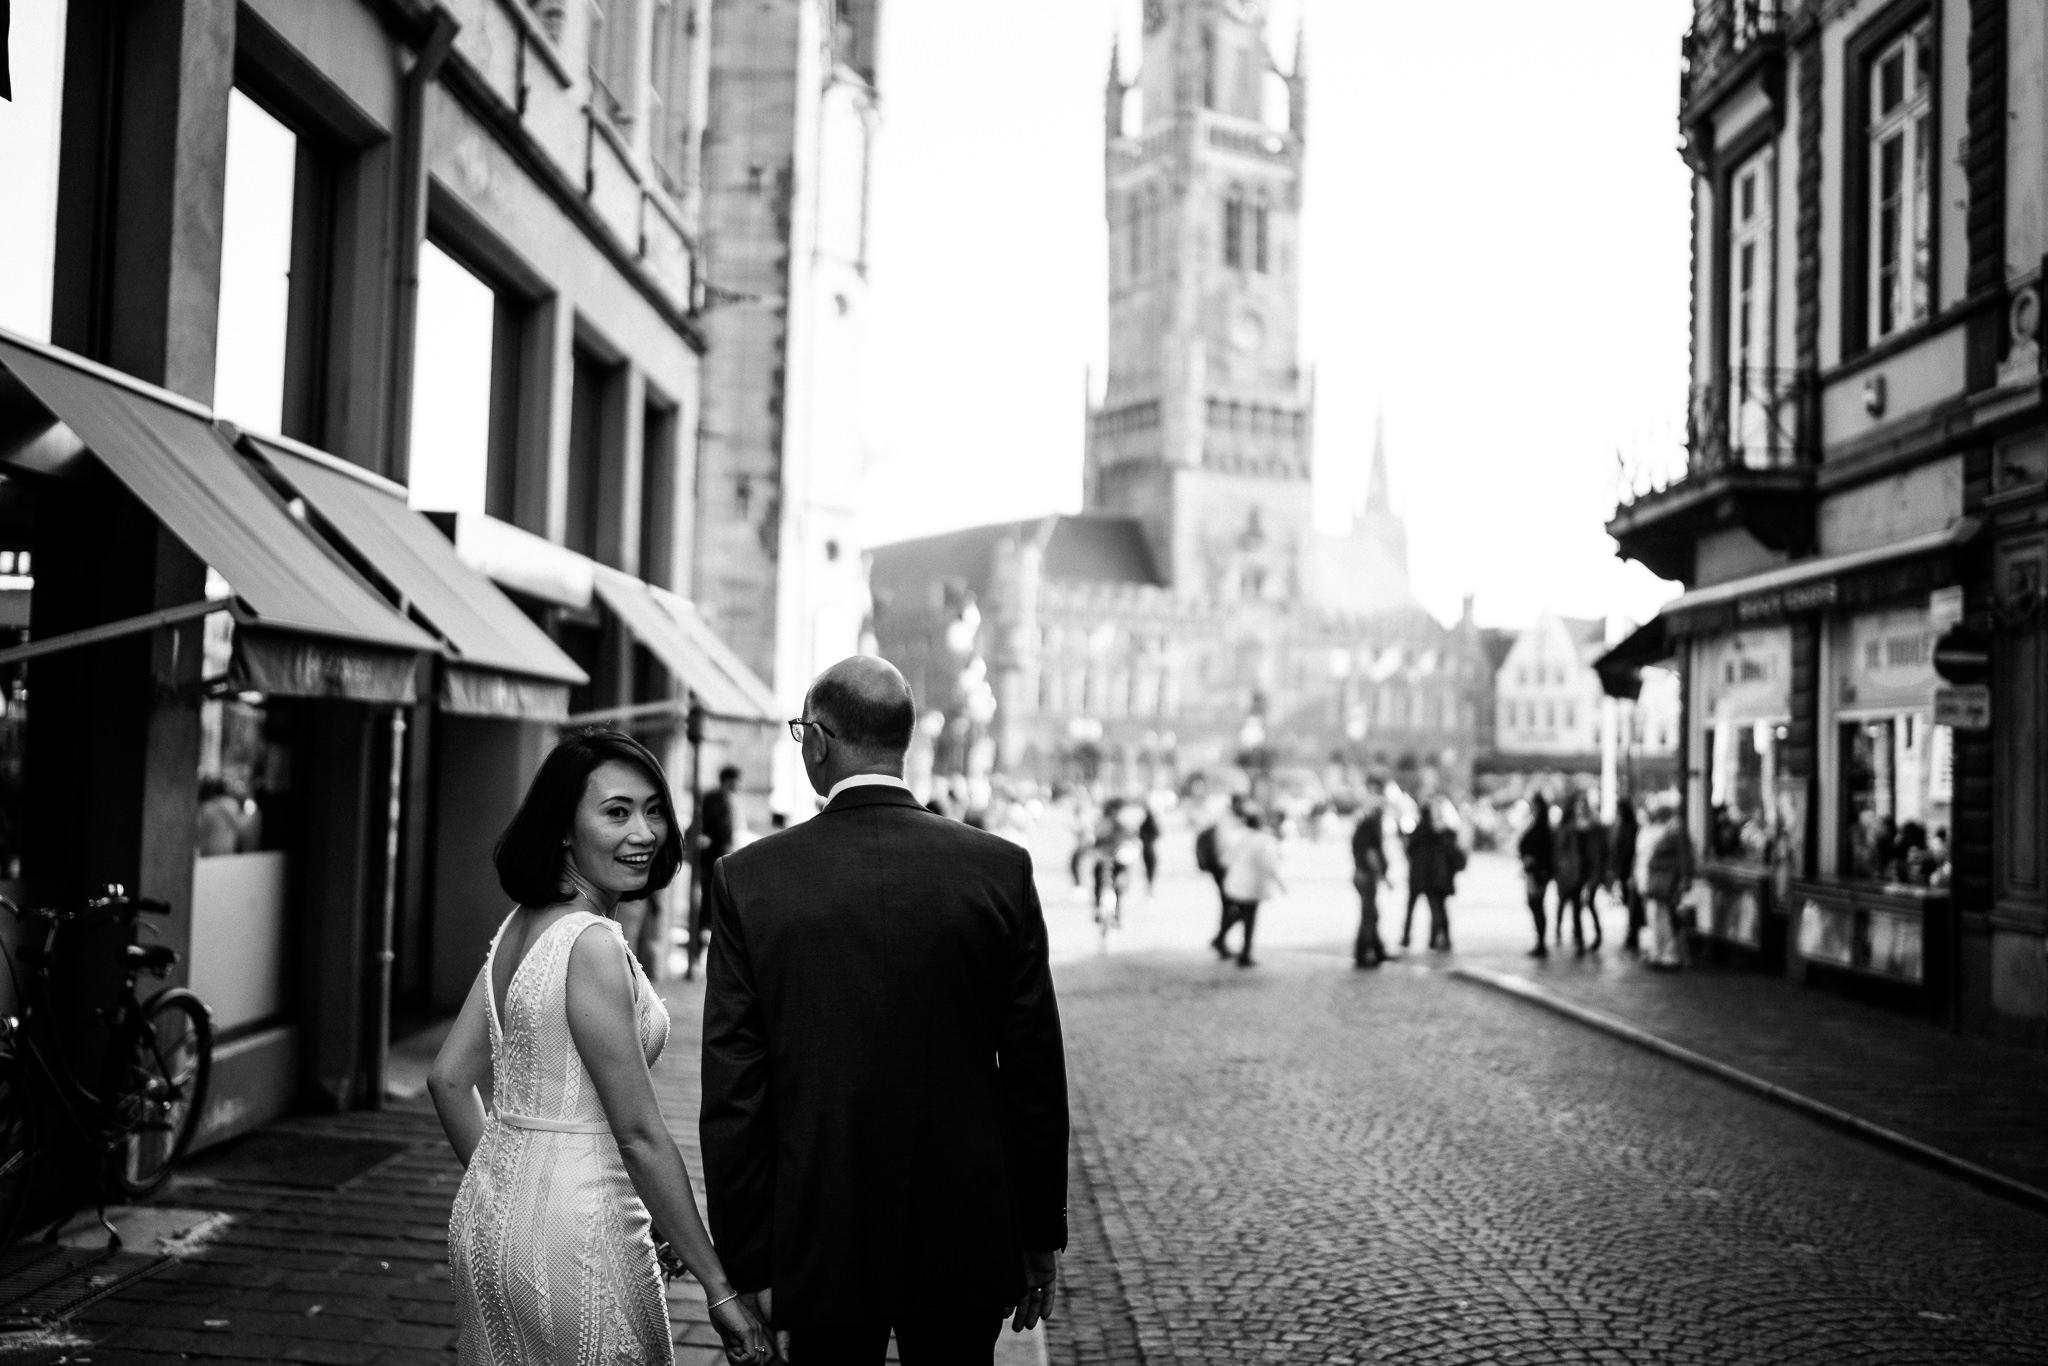 Wedding-Dona&Chris-10102018-small-242.jpg